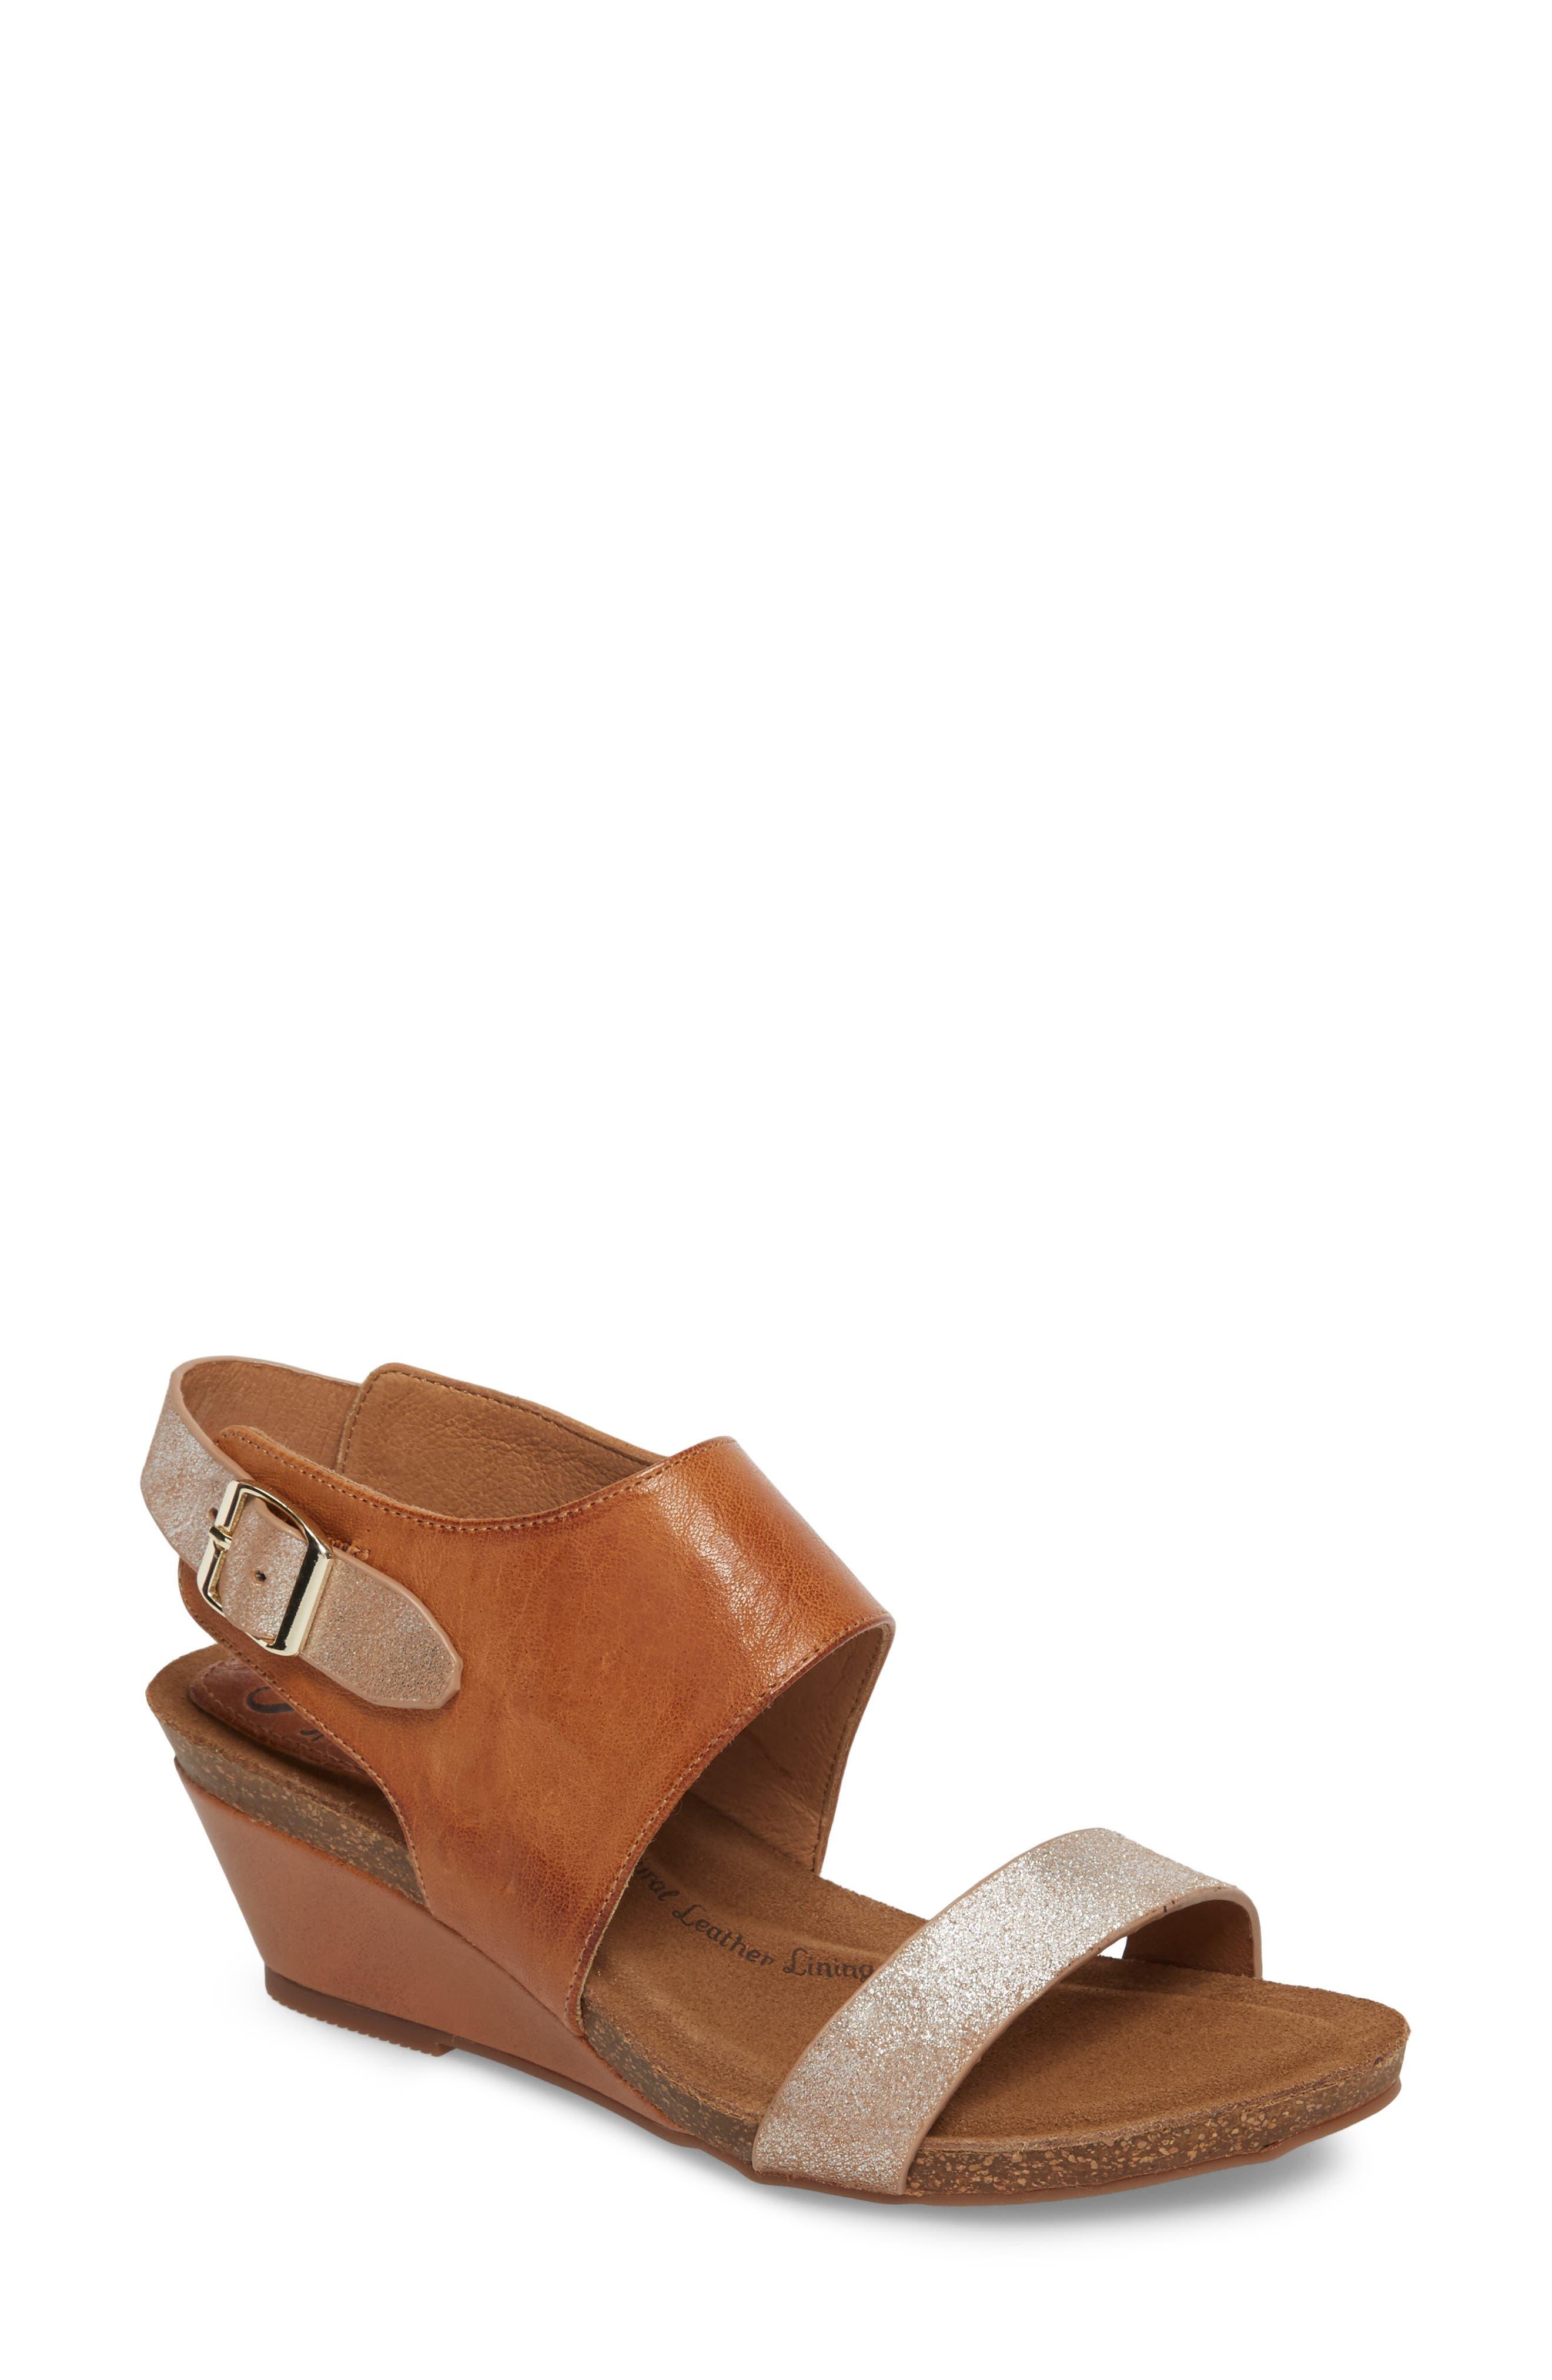 Sofft Women's 'Vanita' Leather Sandal